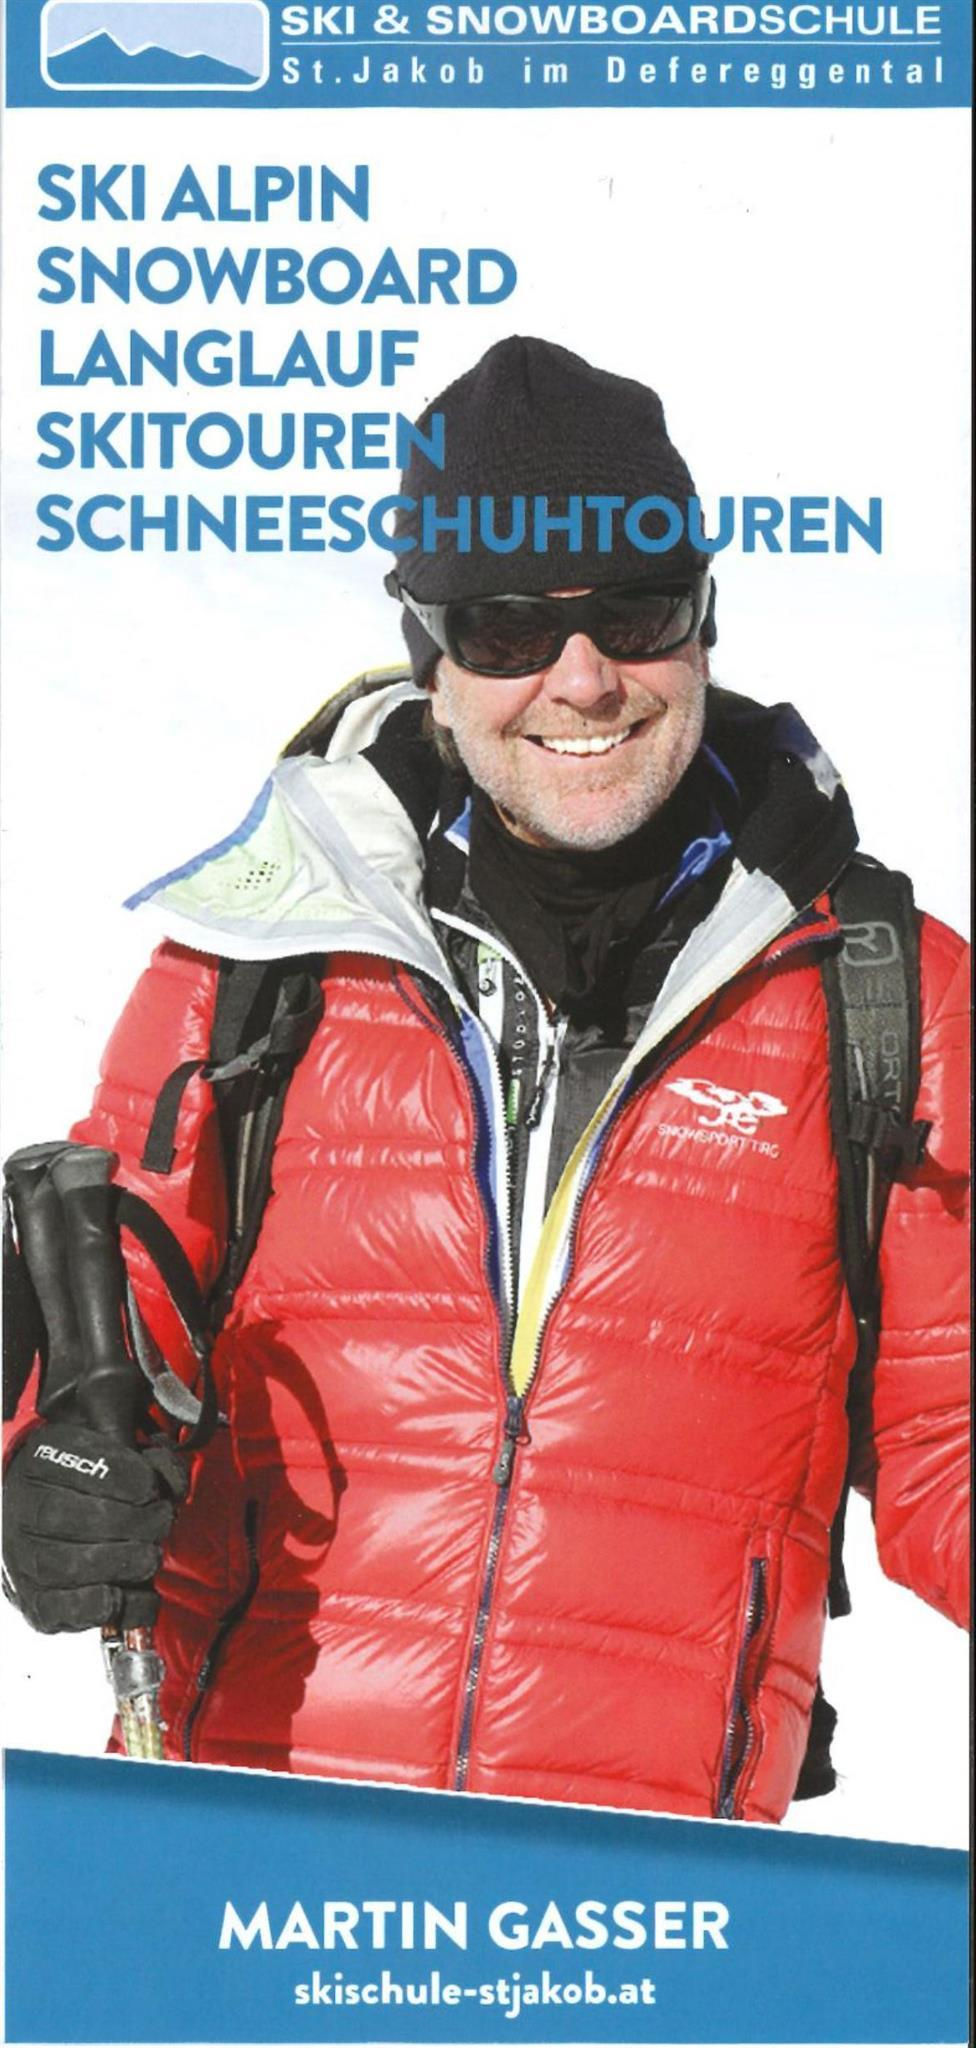 Ski-und-Snowboardschule-Defereggental.jpg